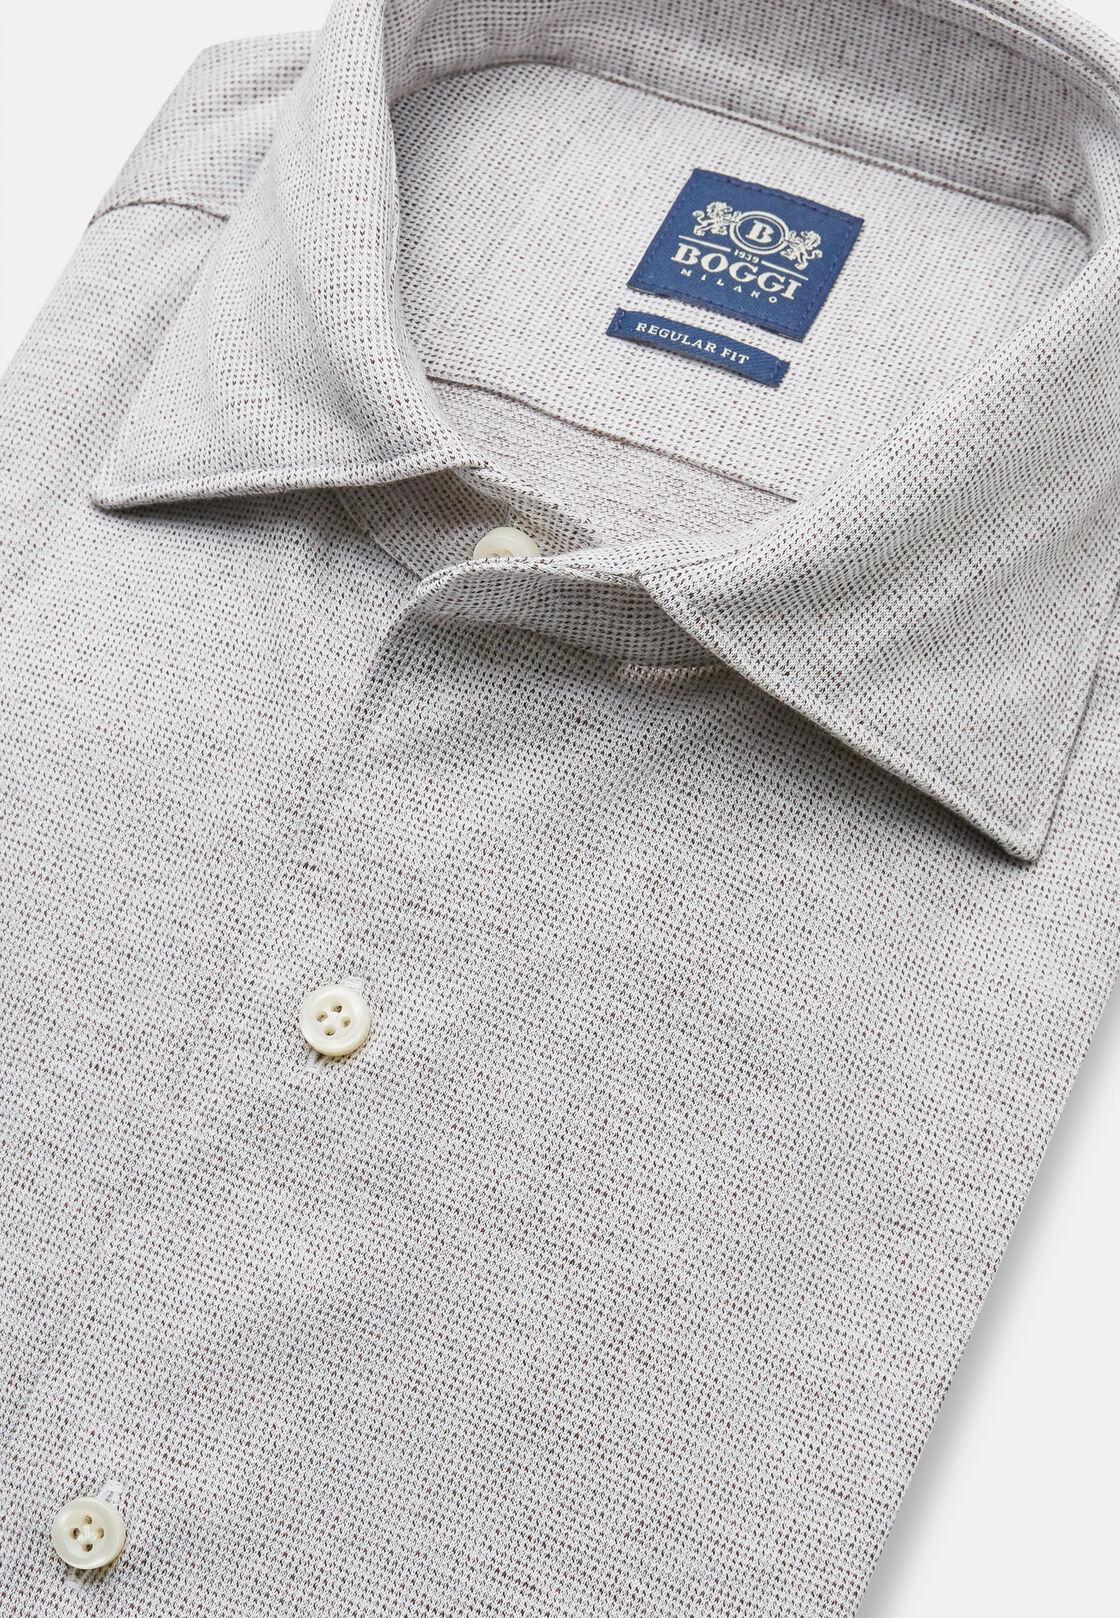 Polohemd aus baumwolljersey mit mikromuster, Taupe, hi-res